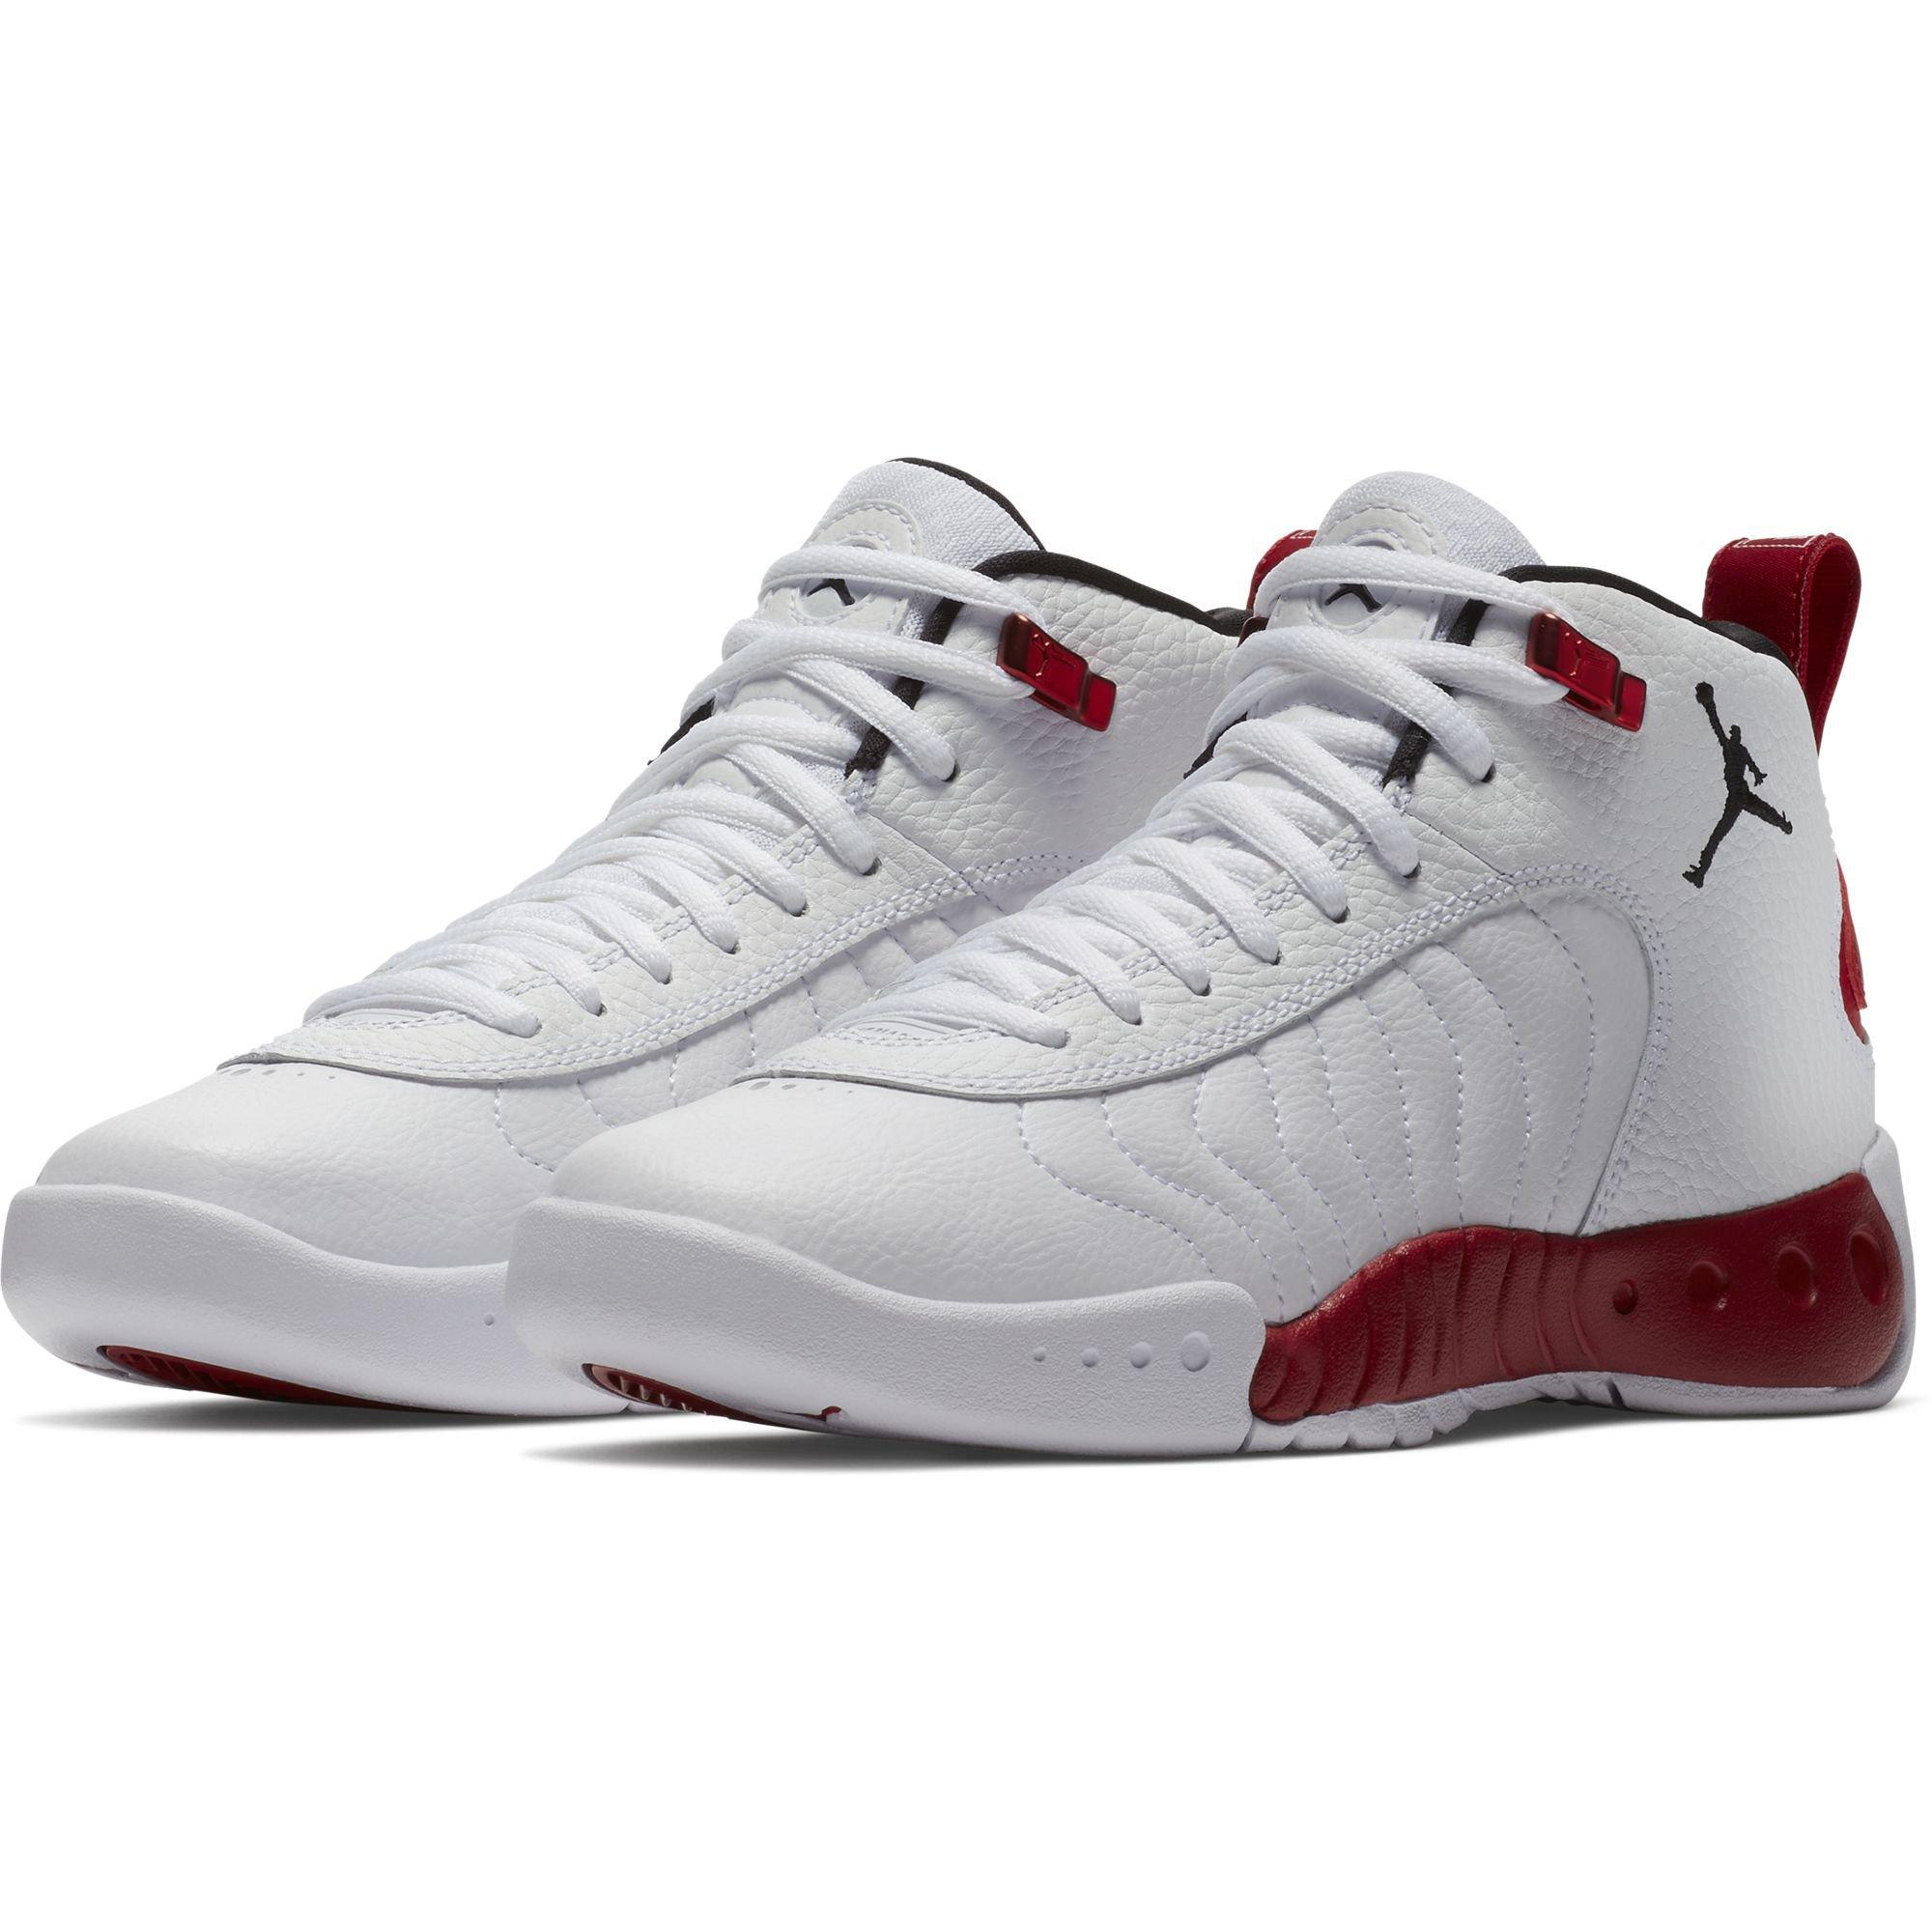 Nike 907973-120 : Jordan Boy's Jumpman Pro Basketball Shoe, White/Black-Gym Red (5 M US Big Kid) by Jordan